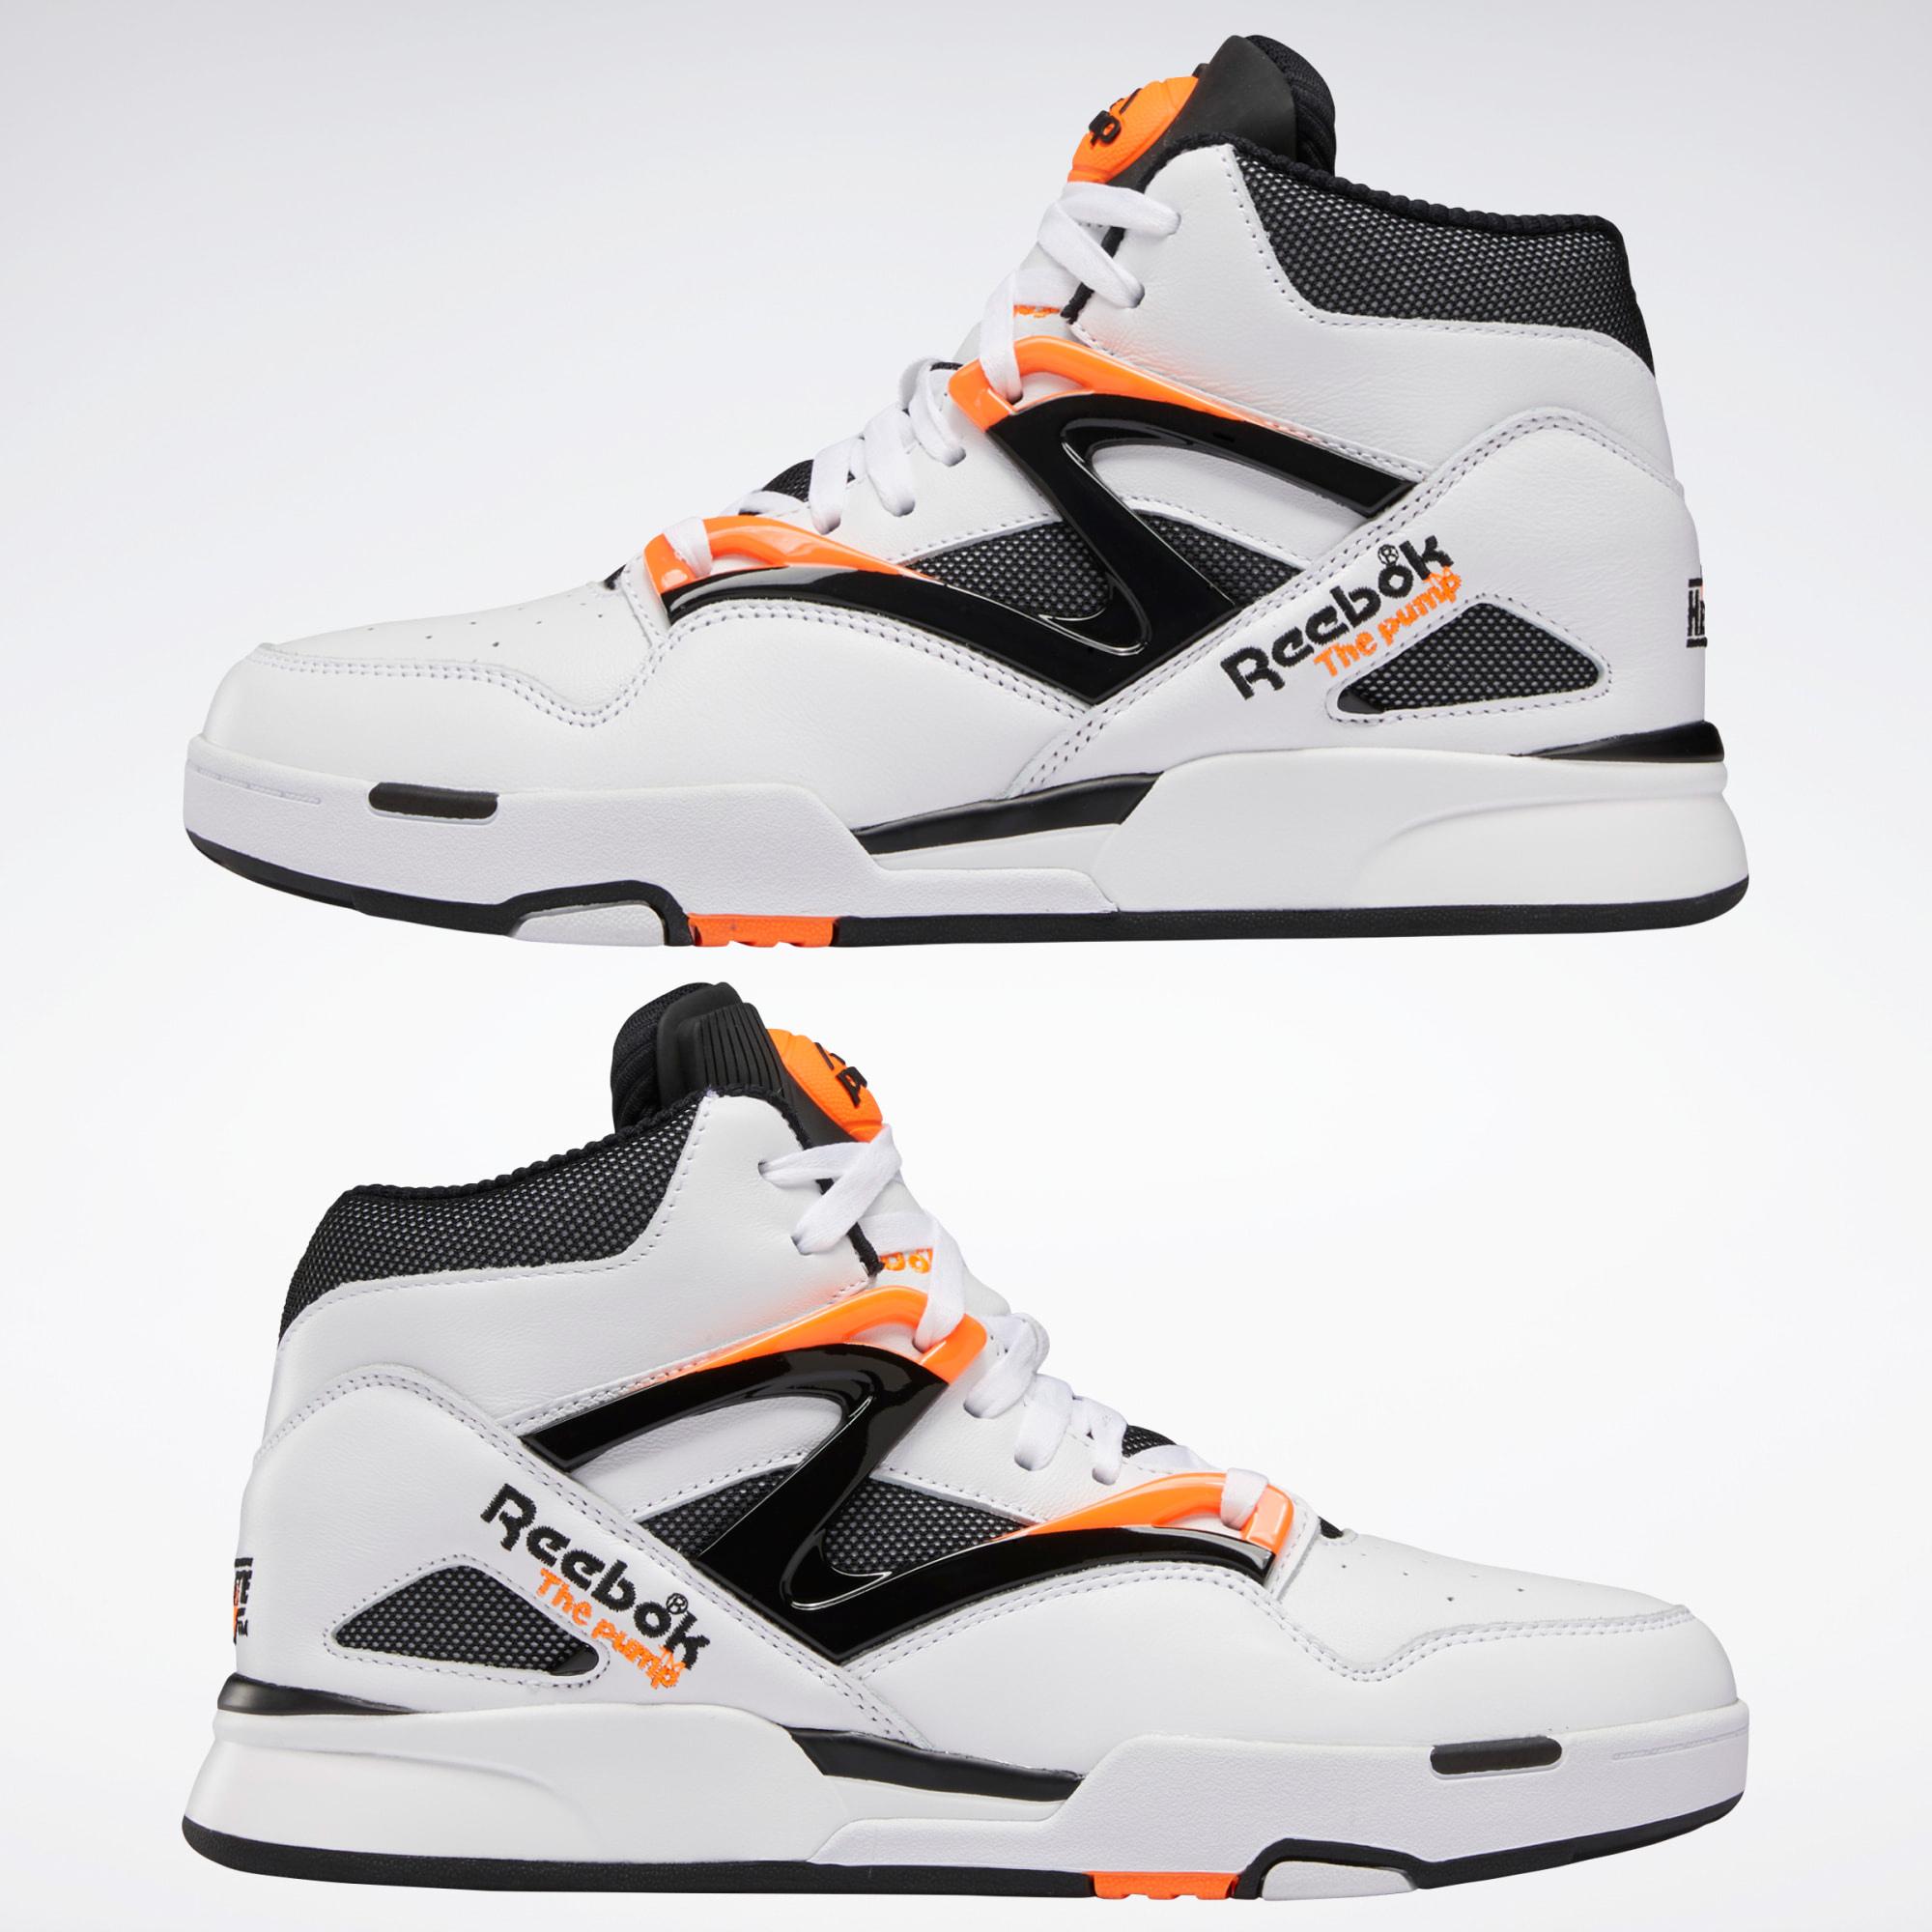 reebok-pump-omni-zone-2021-white-black-orange-2